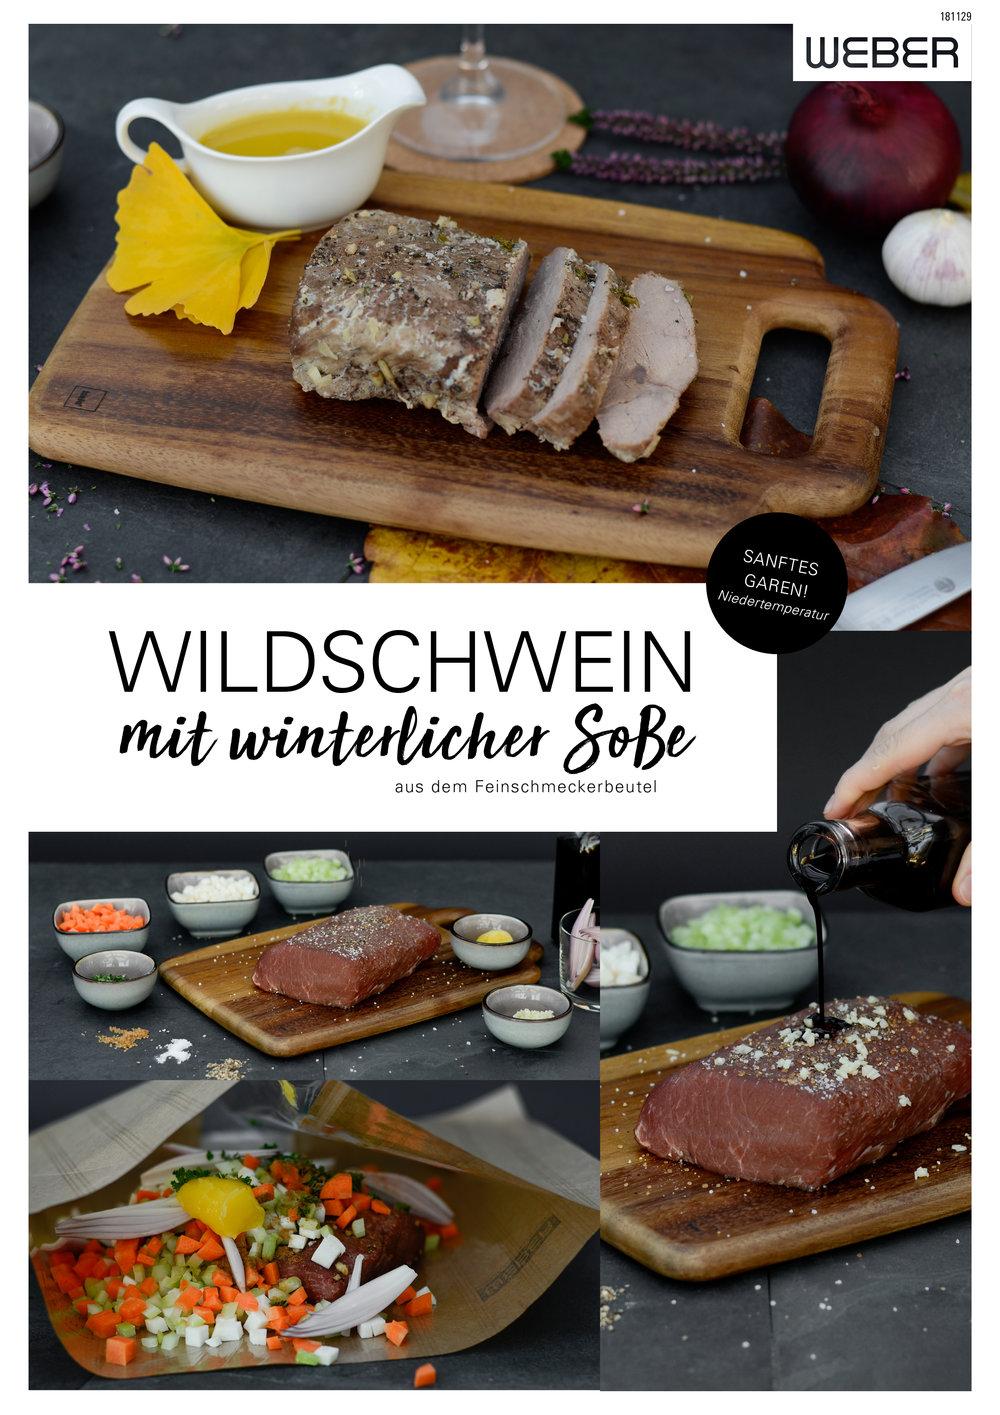 Wildschwein-WEBAfilm-Thermheatbeutel.jpg